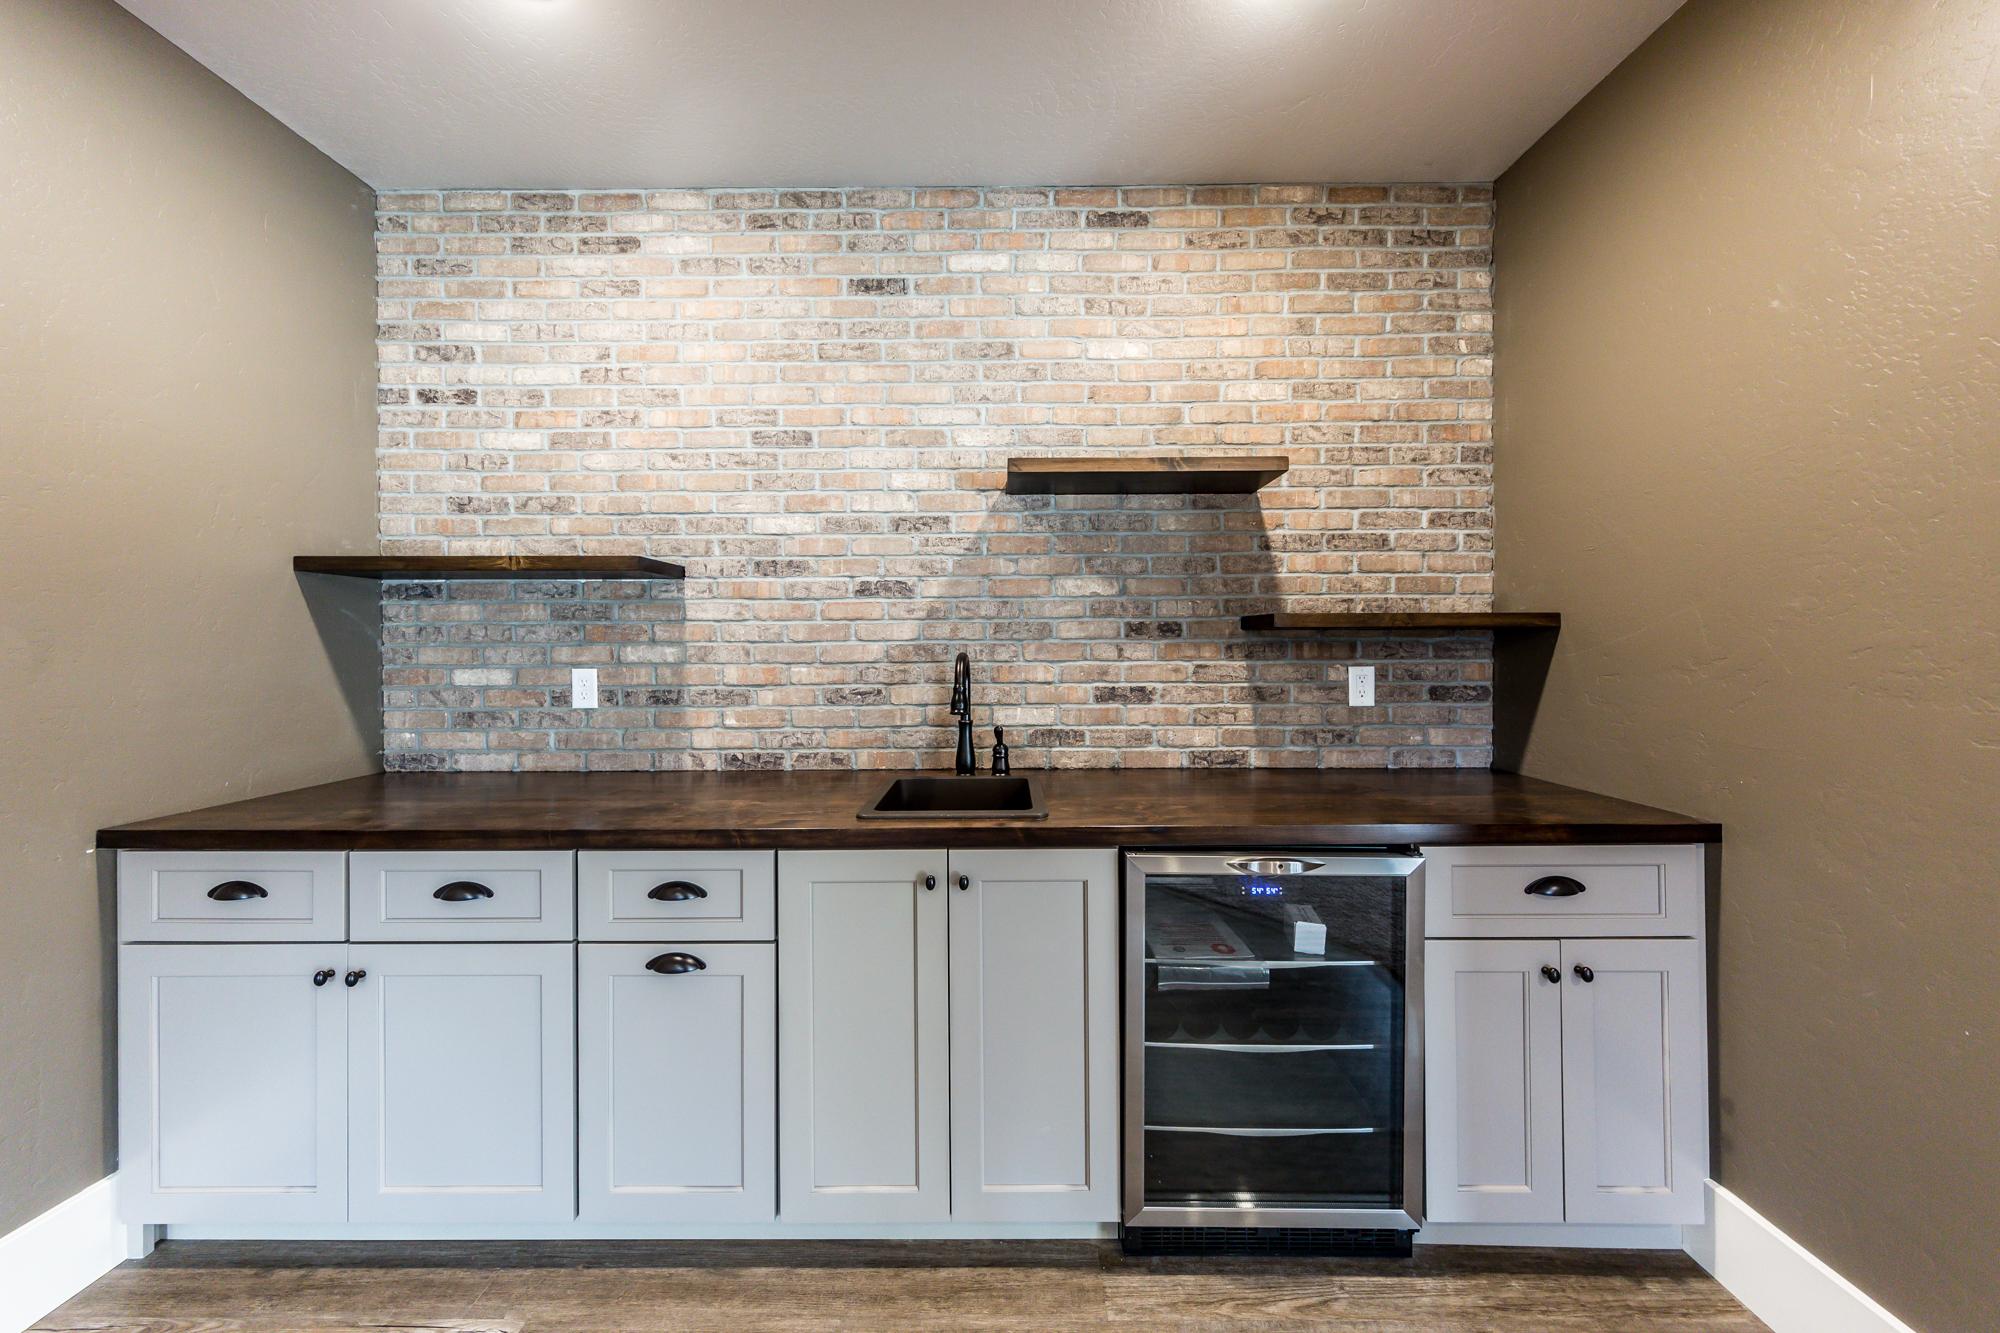 New-Construction-For-Sale-Bethel-Ridge-Farms-Scott-AFB-Illinois-34.jpg